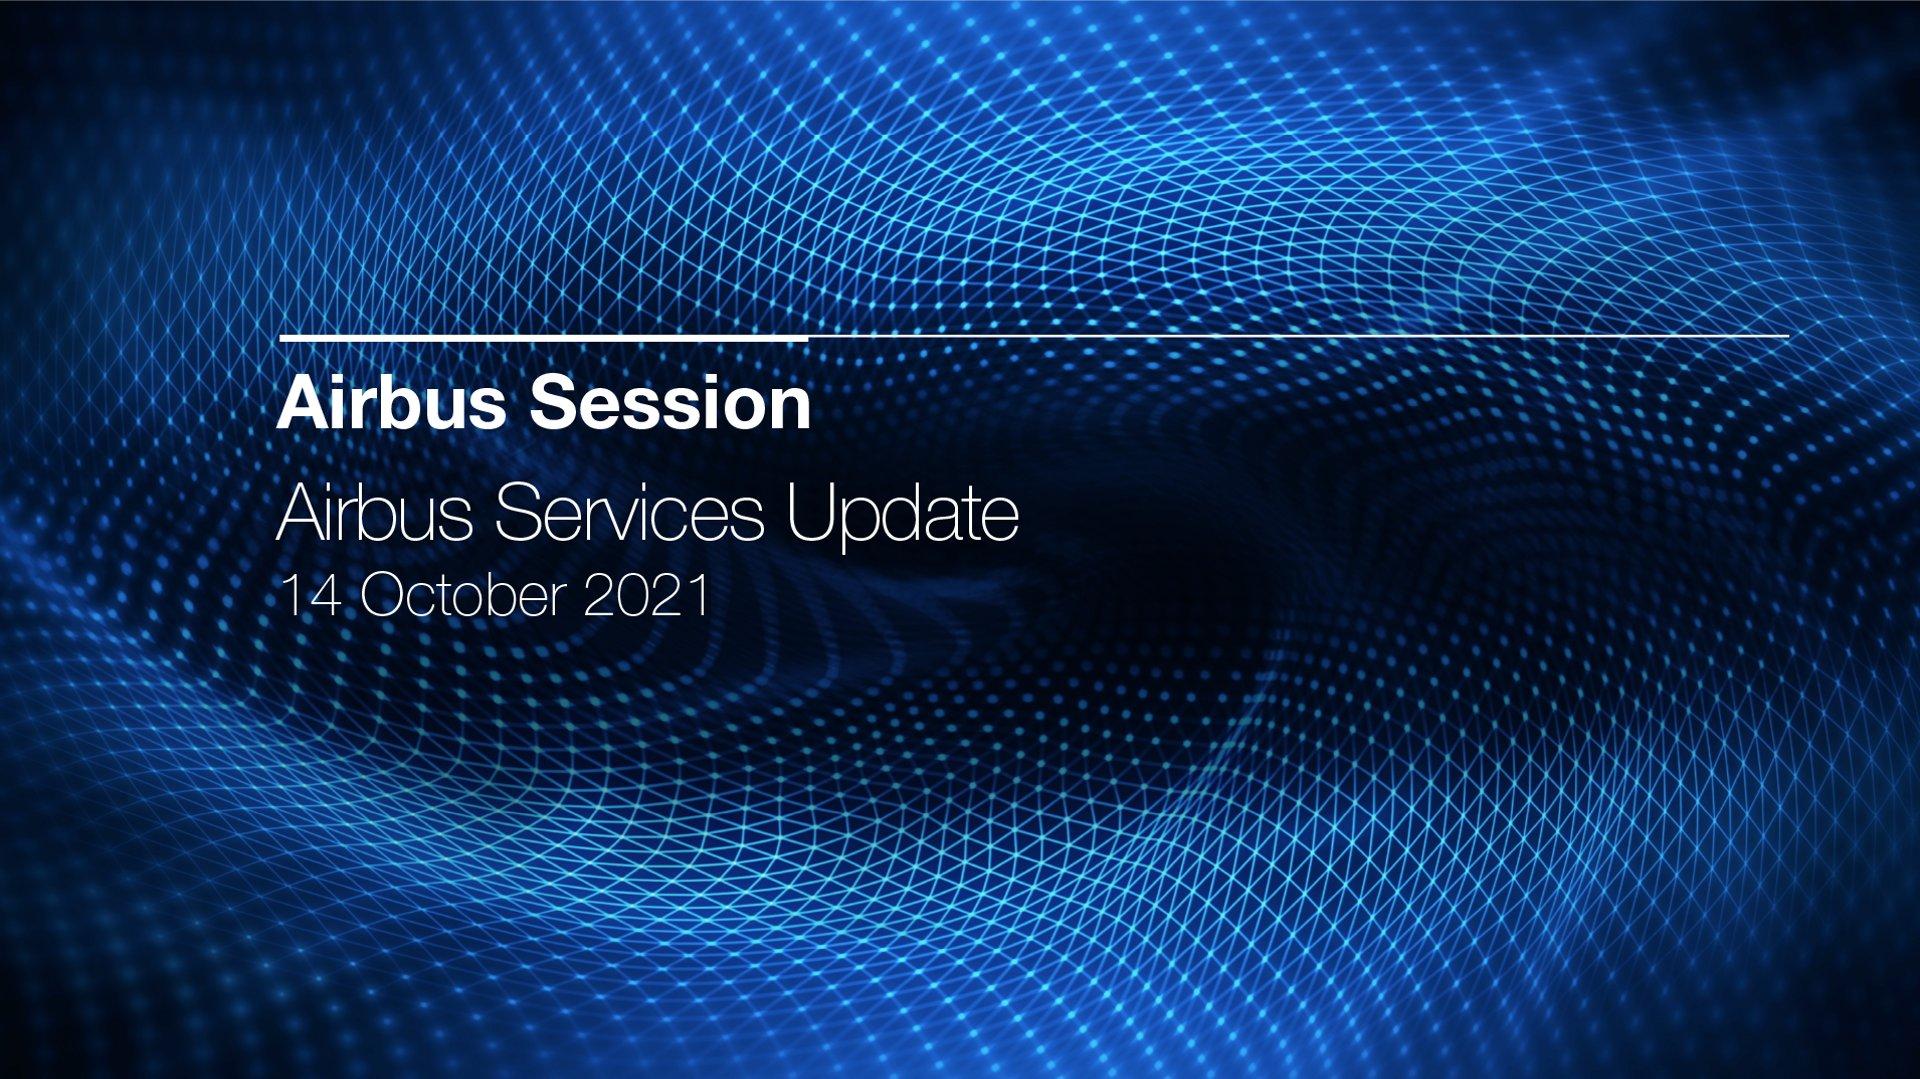 Airbus Services Update 2021